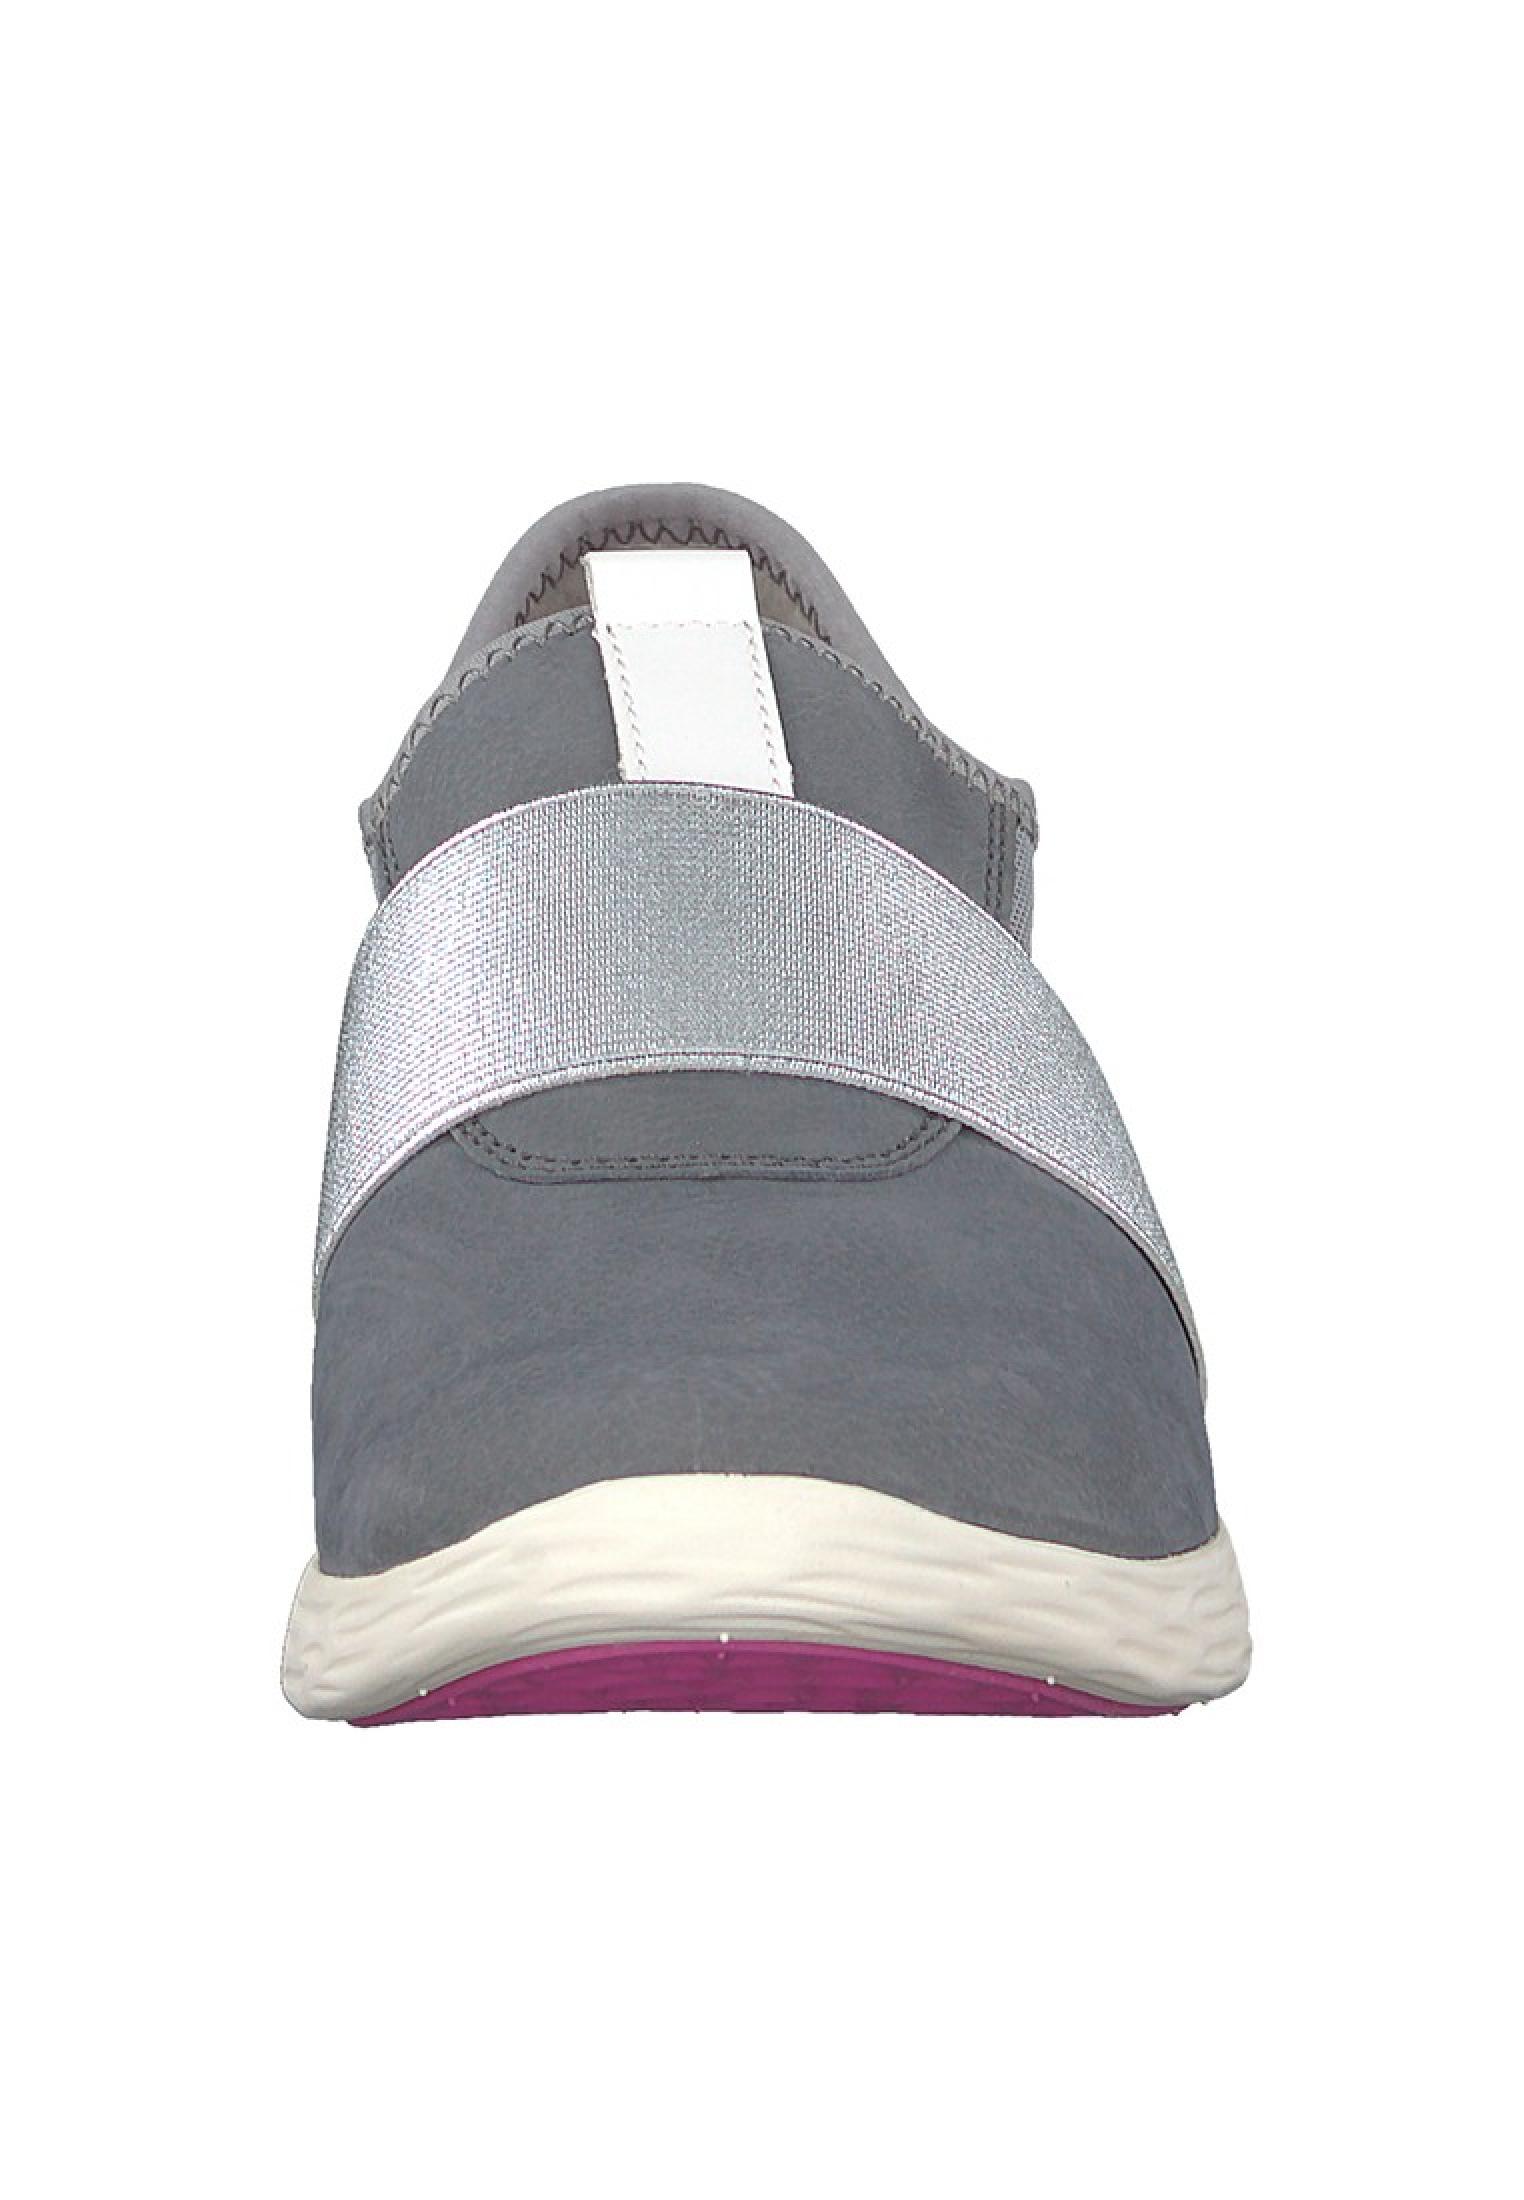 Tamaris Sneaker Grau mit YOGA IT Sohle 1 24729 28 206 Steel Comb